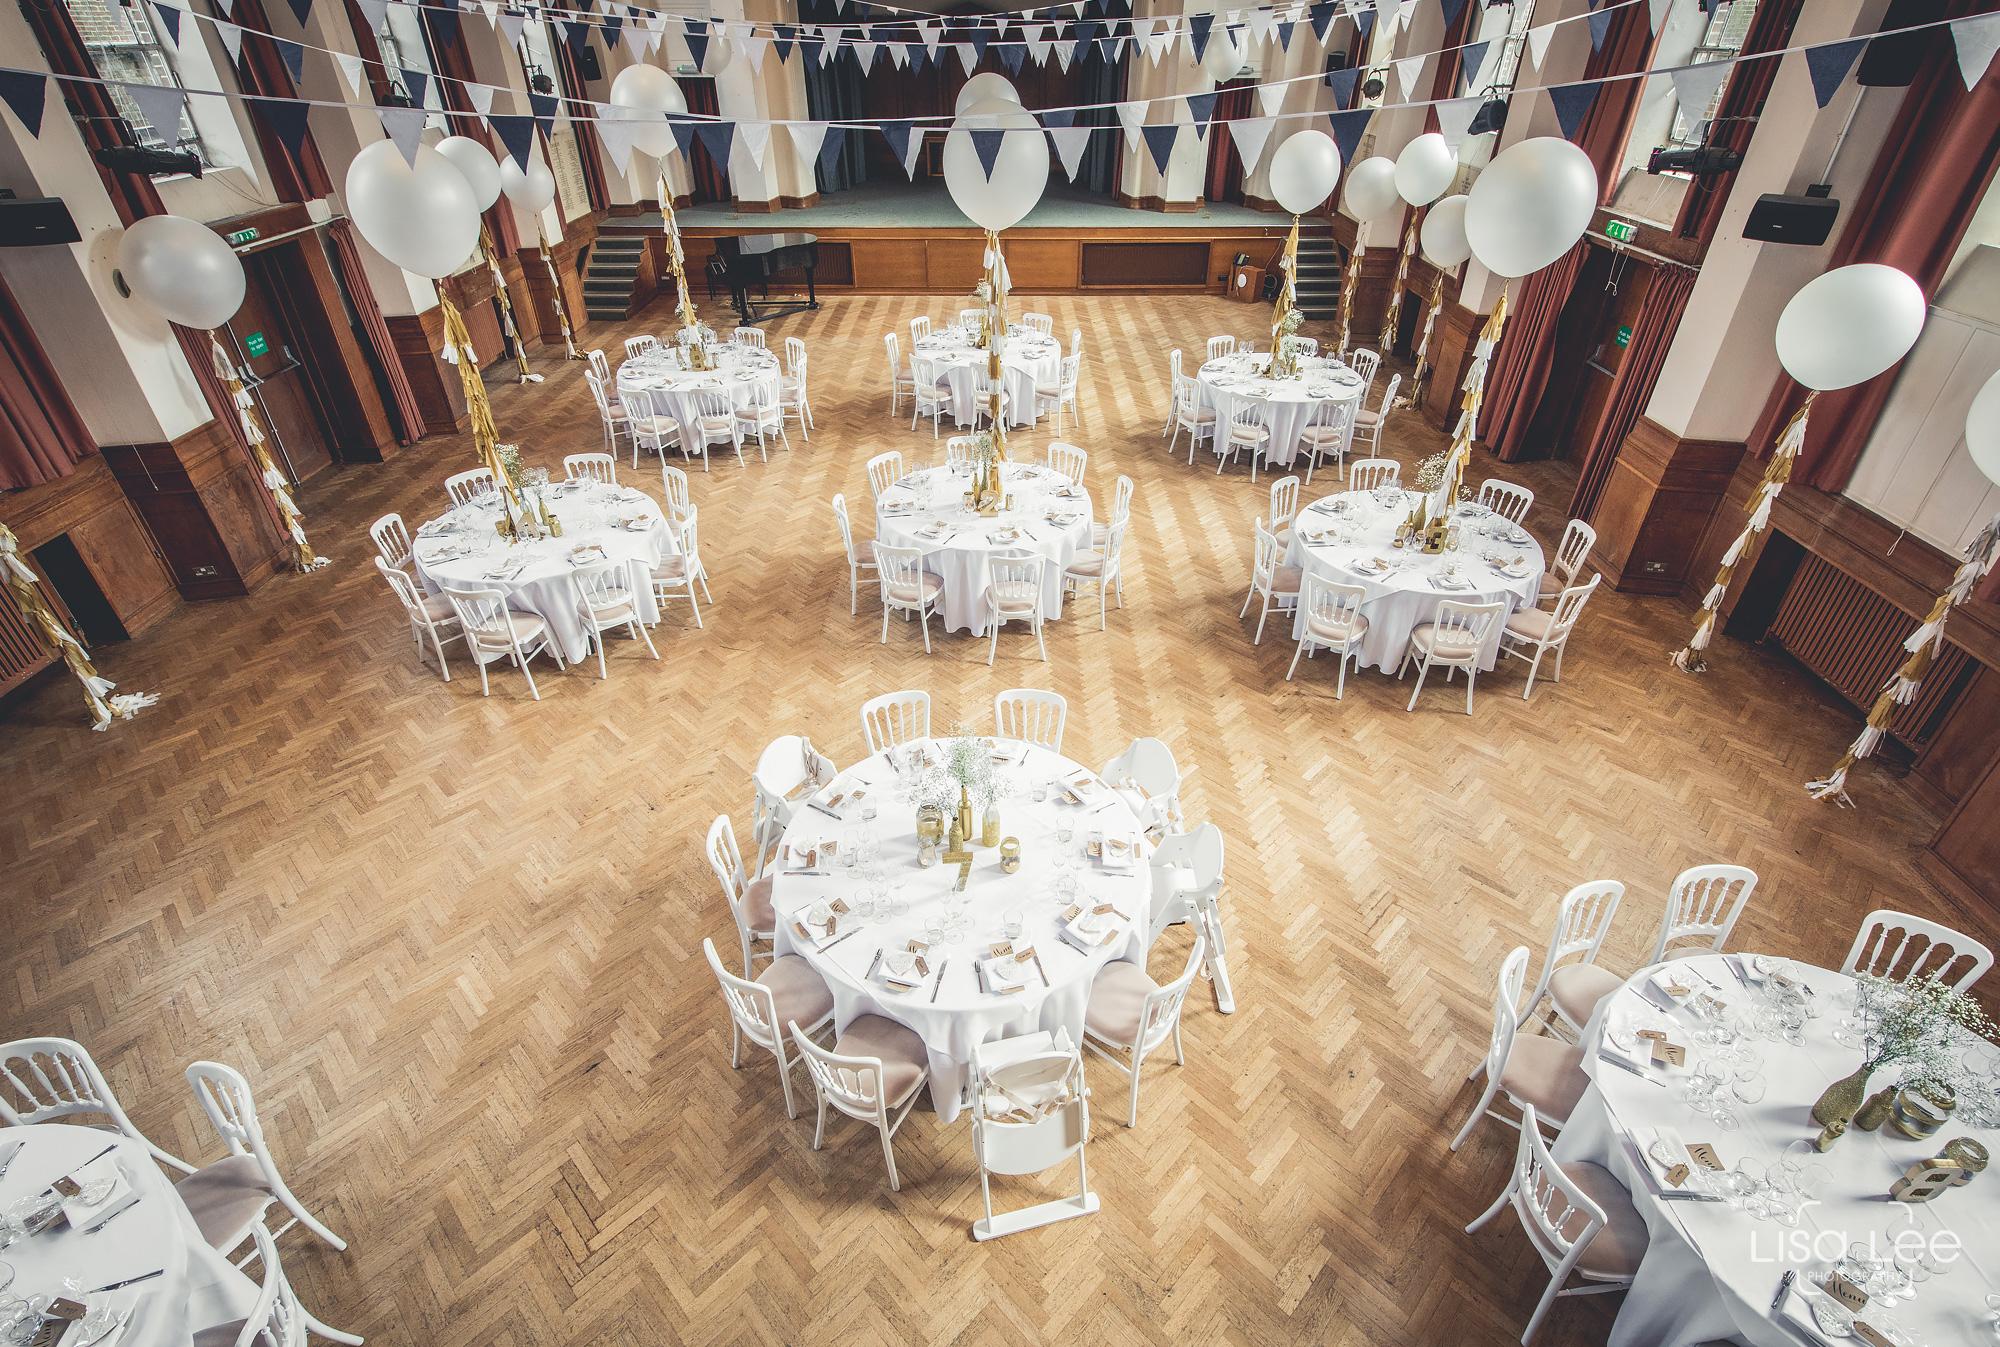 lisa-lee-wedding-photography-afternoon-tea-talbot-heath-2.jpg